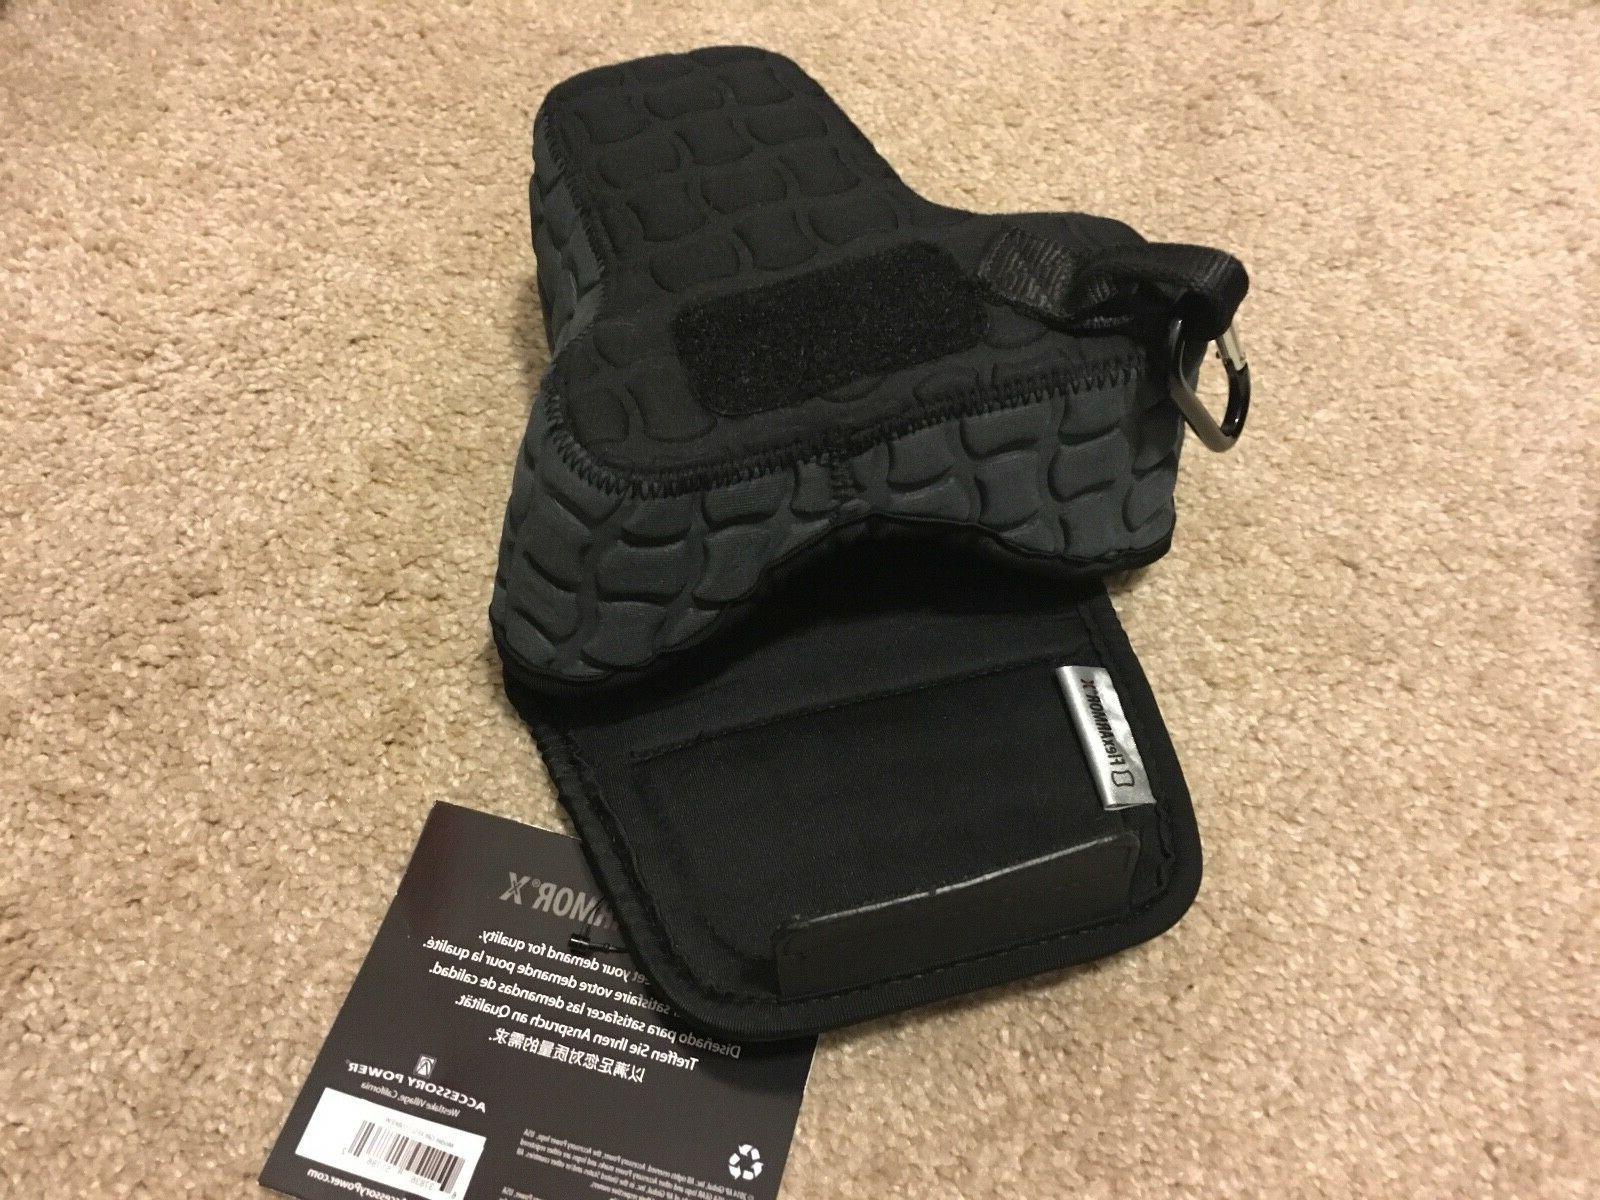 USA FlexARMOR DSLR Sleeve with Accessory Pocket